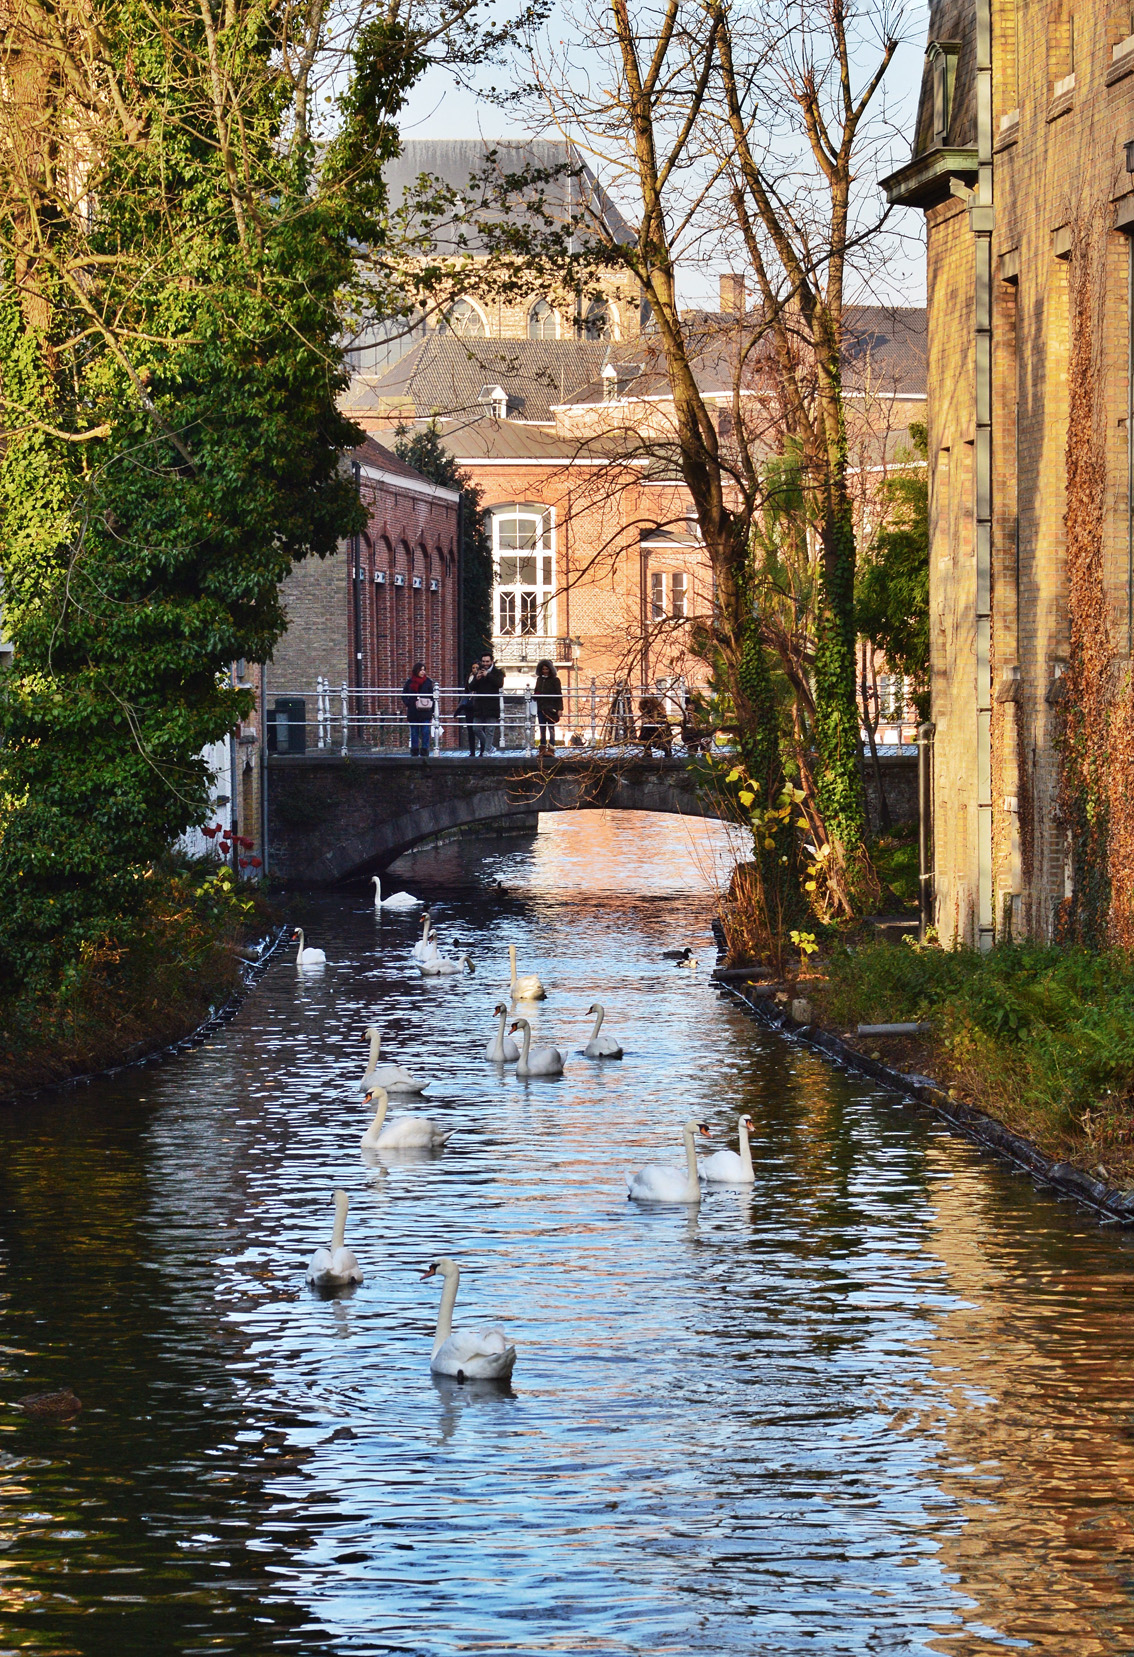 17-1 Un weekend in Belgio. Alla scoperta delle Fiandre: Bruges .